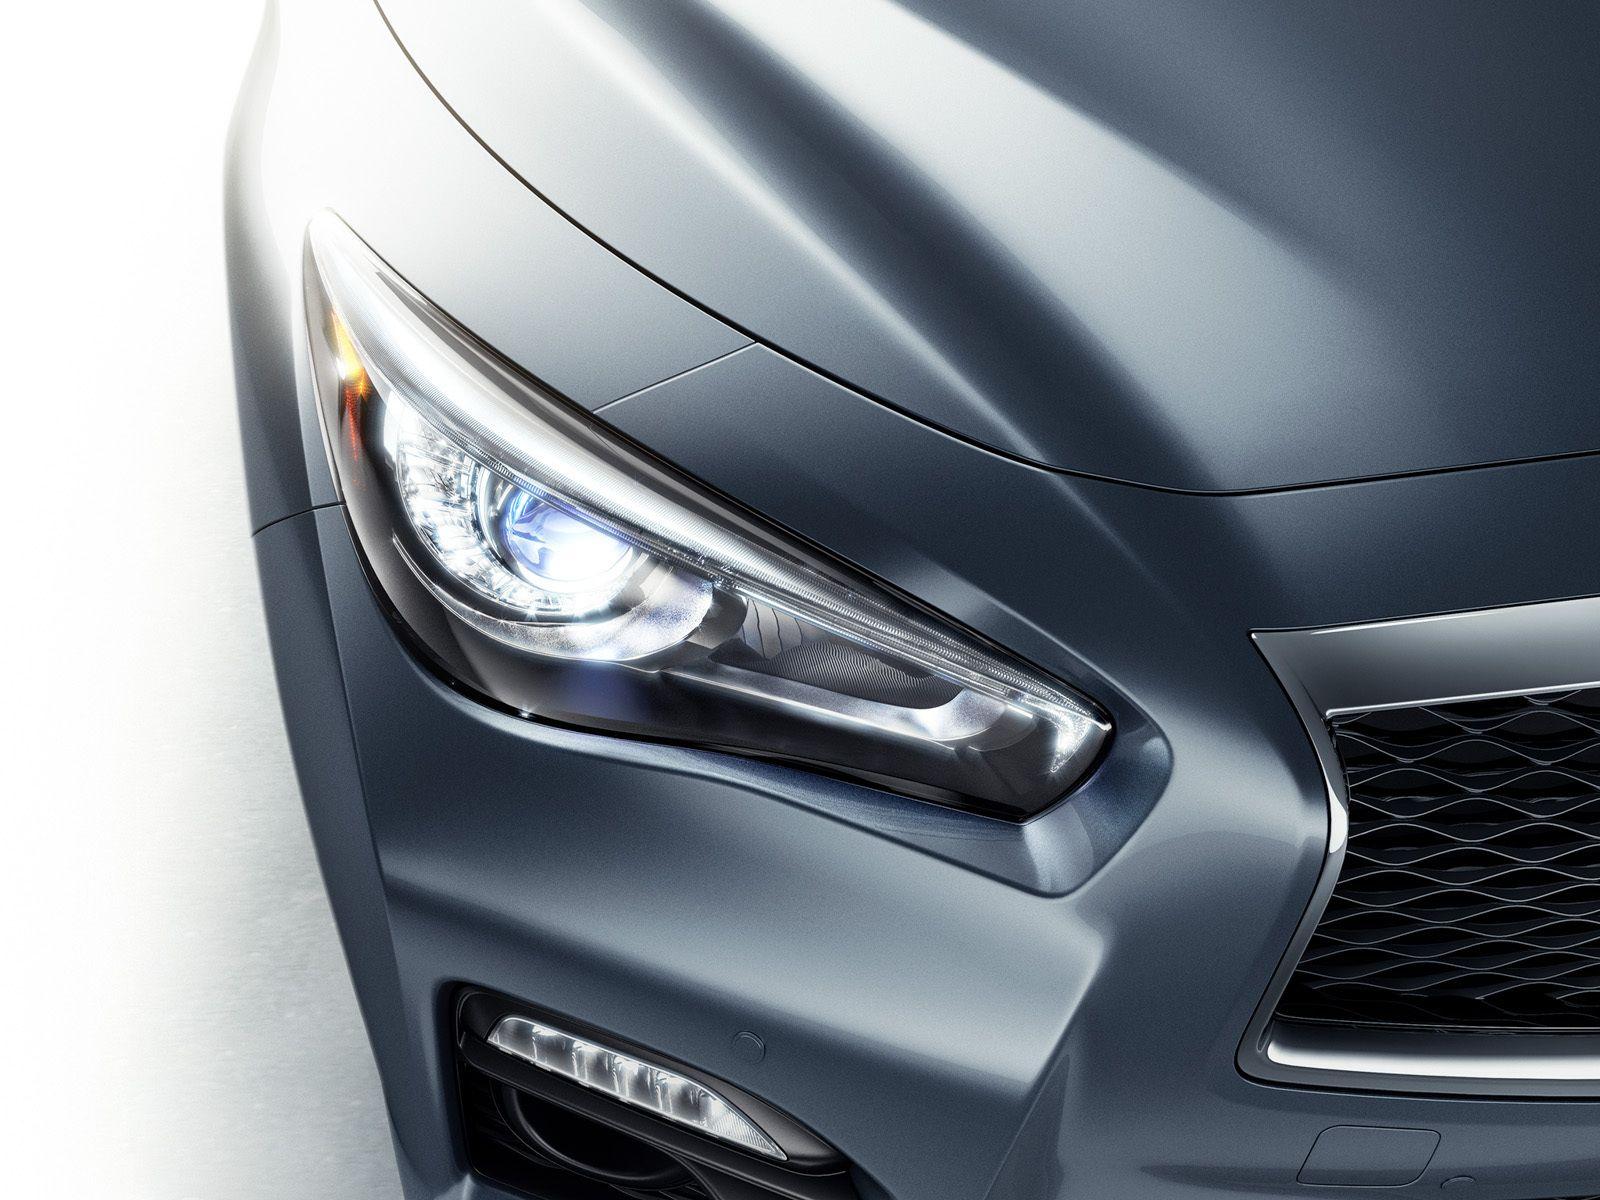 Infiniti Q50 headlight